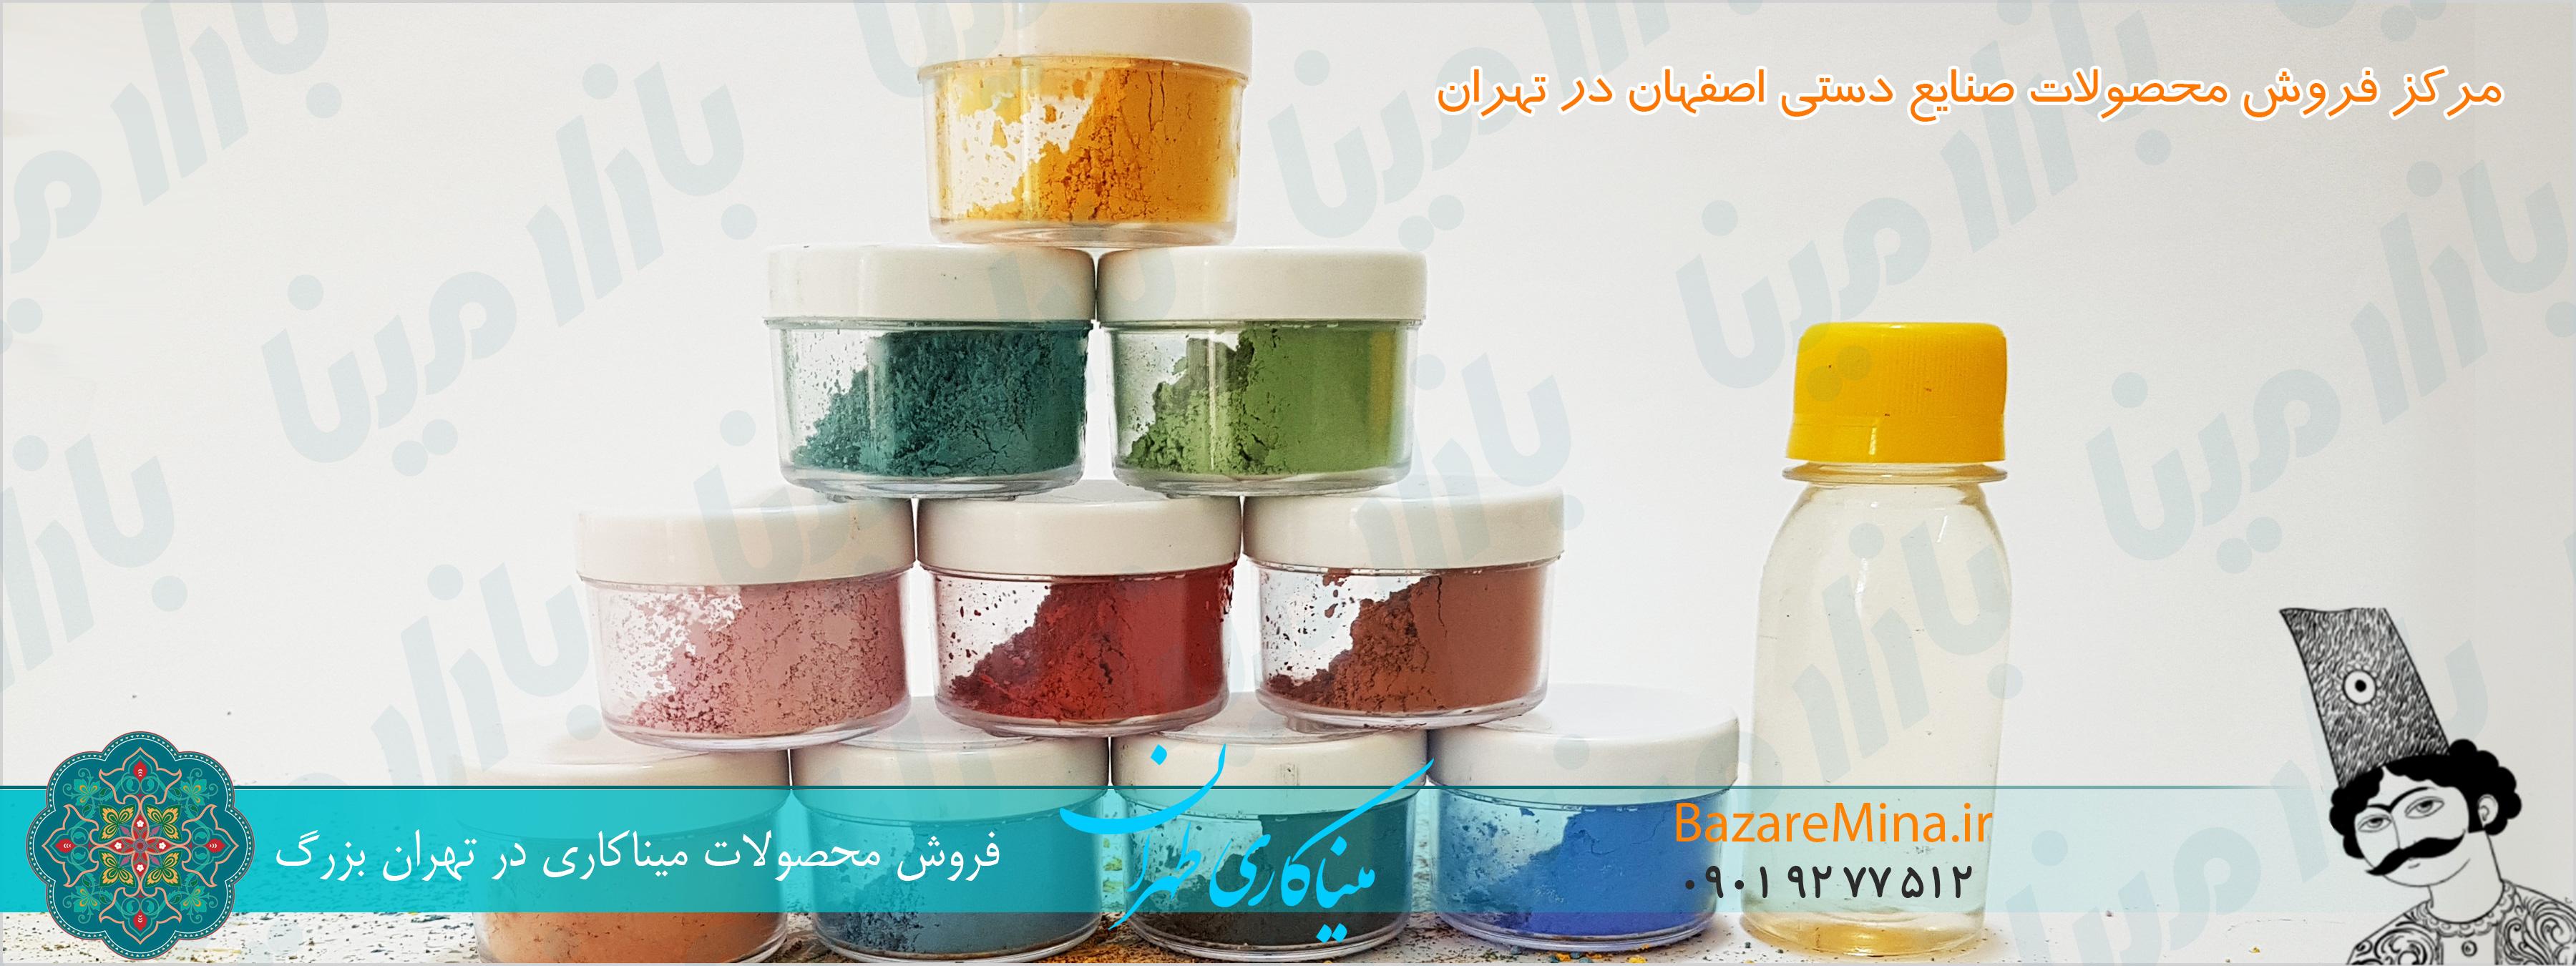 رنگ پودری میناکاری تهران